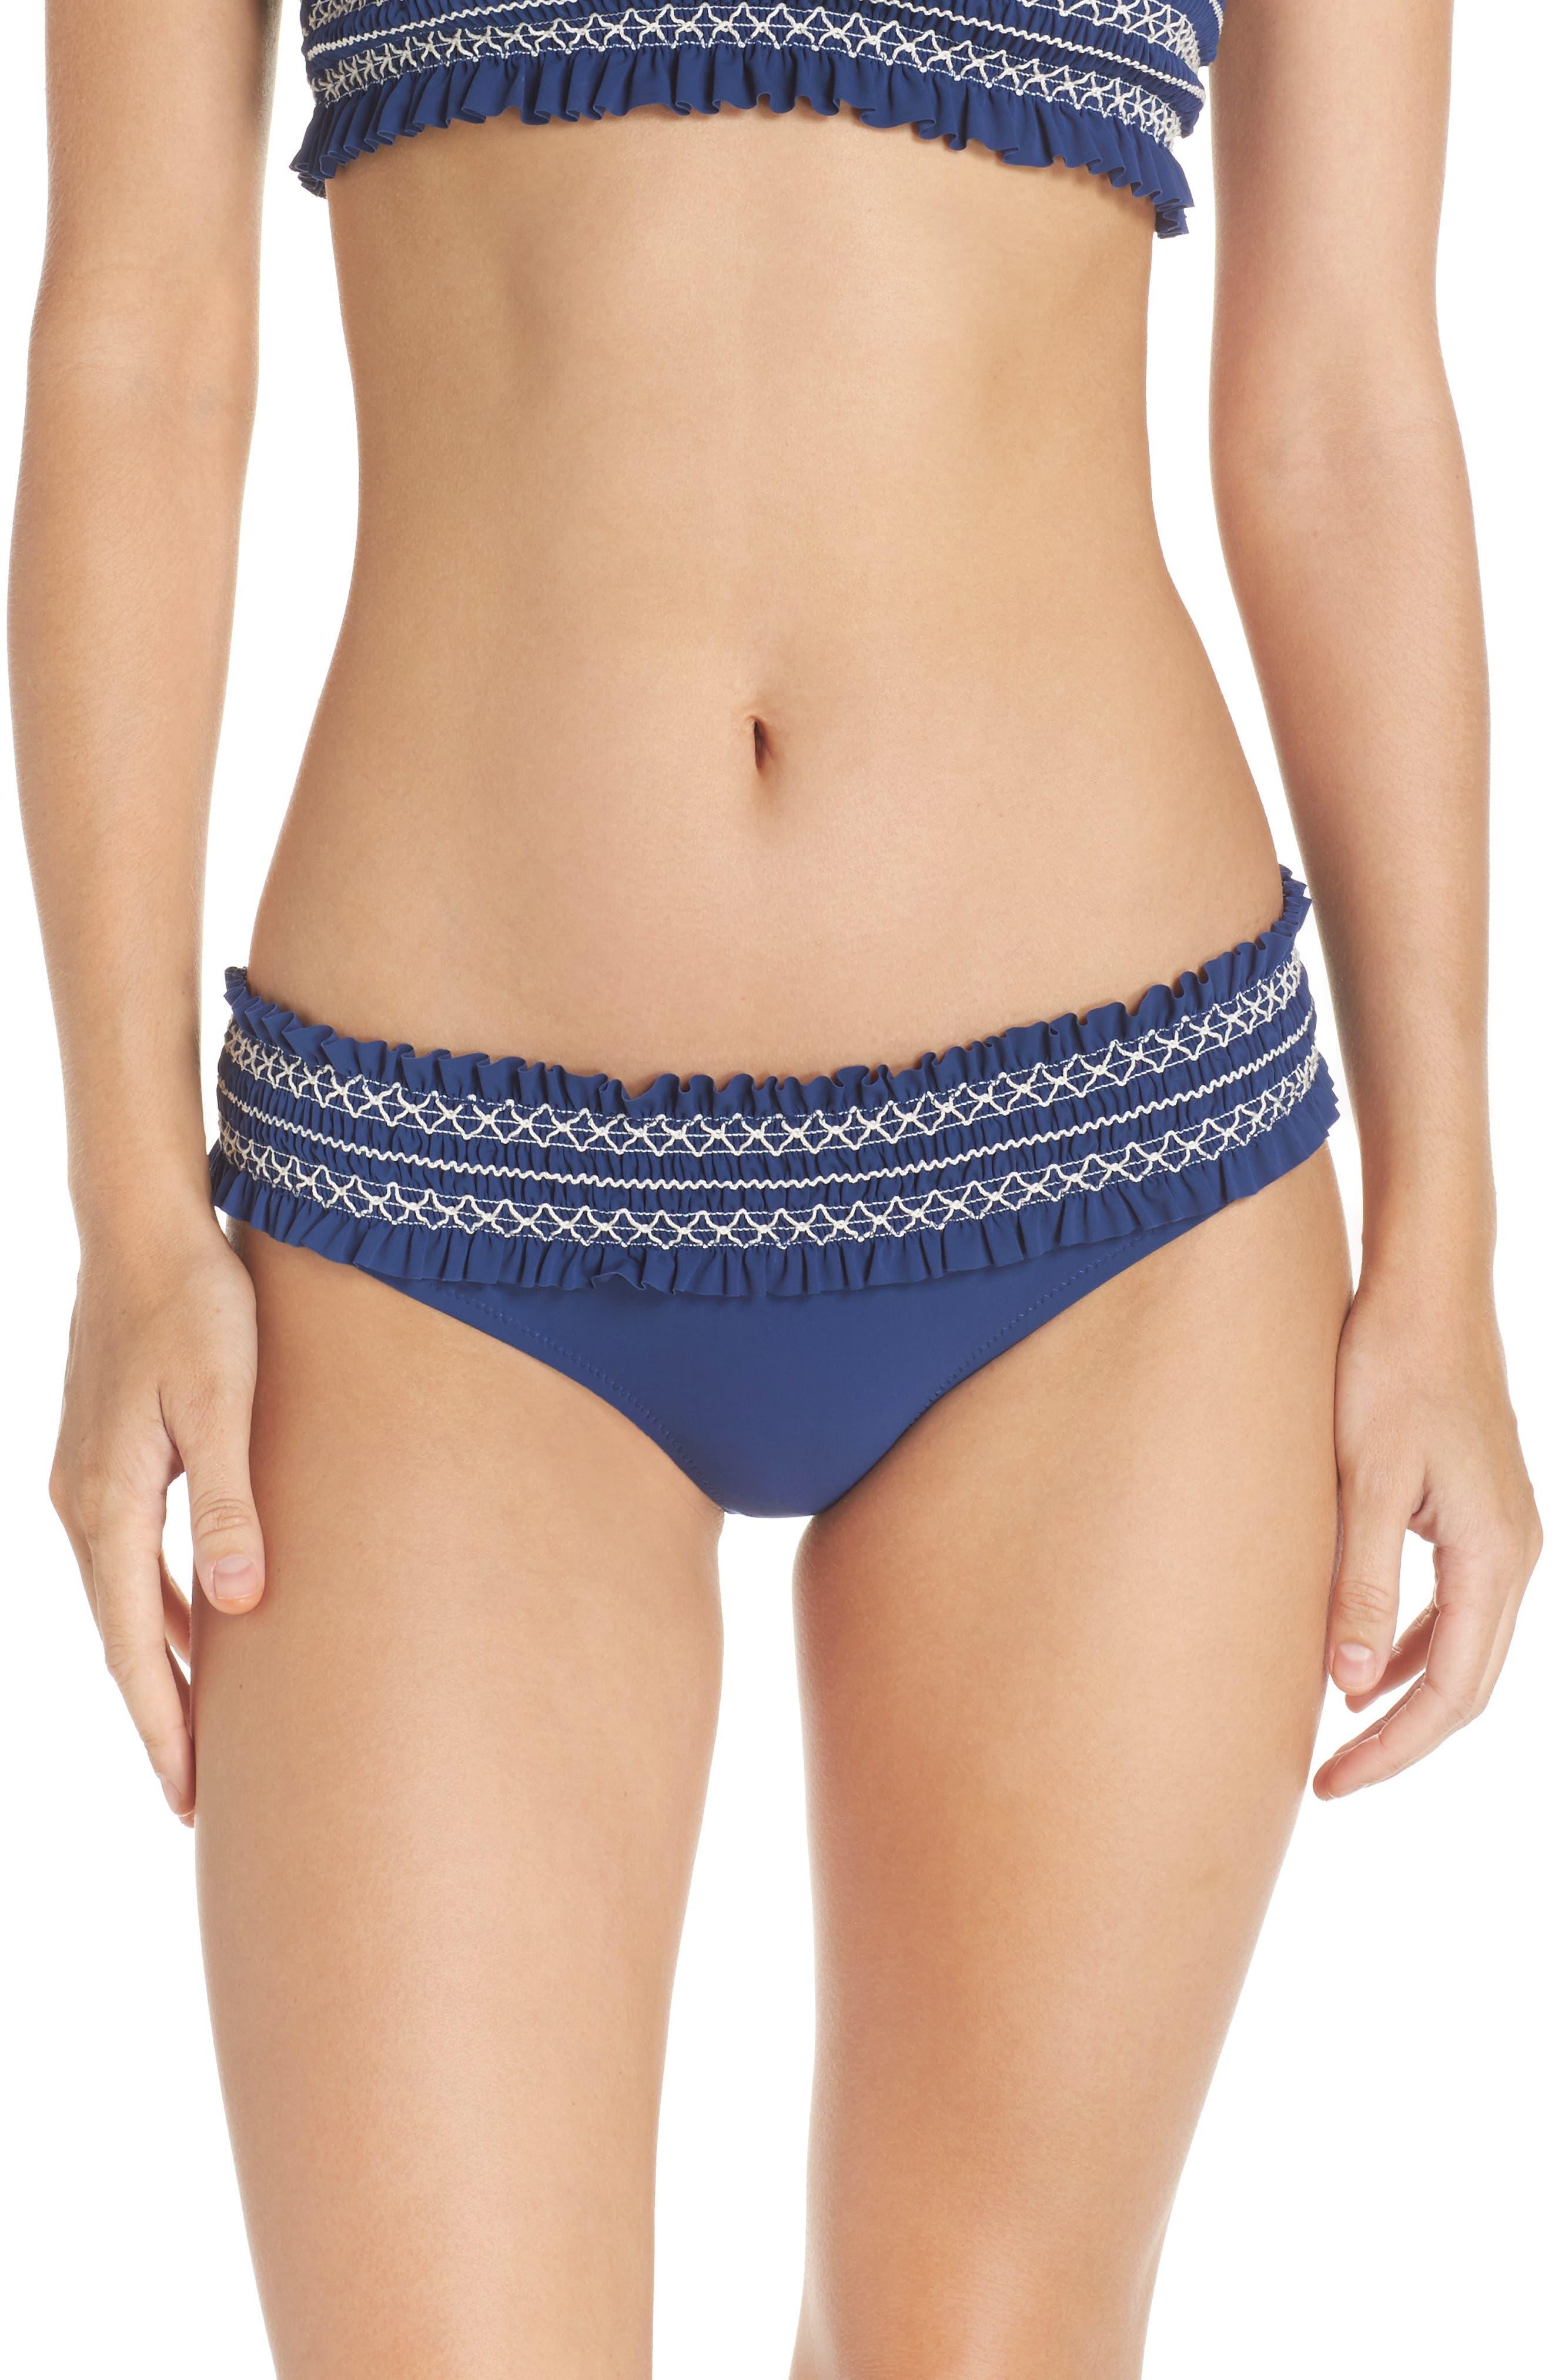 Costa Smocked Hipster Bikini Bottoms,                             Main thumbnail 1, color,                             Capri Blue/ New Ivory